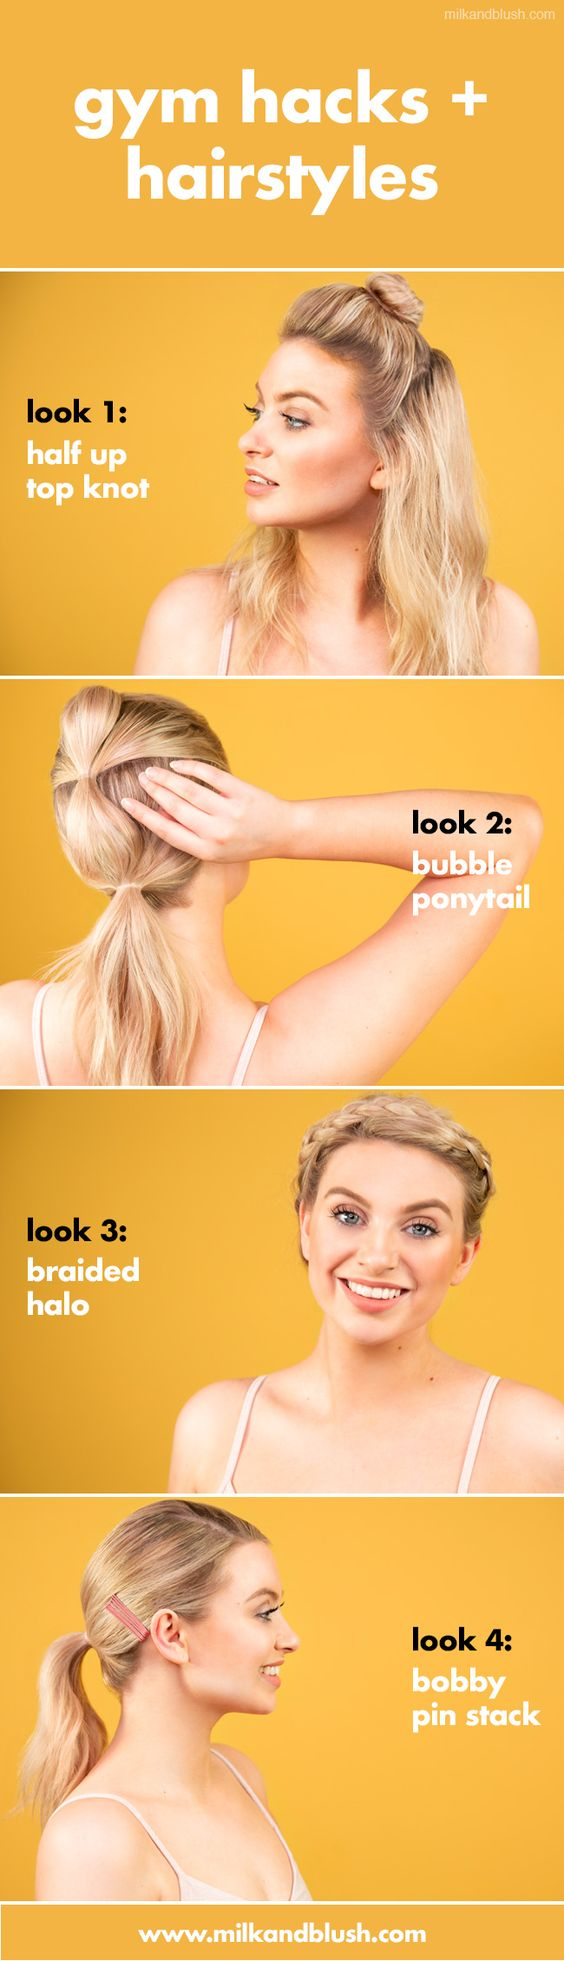 gym-hair-hacks-milk-and-blush-hair-extensions